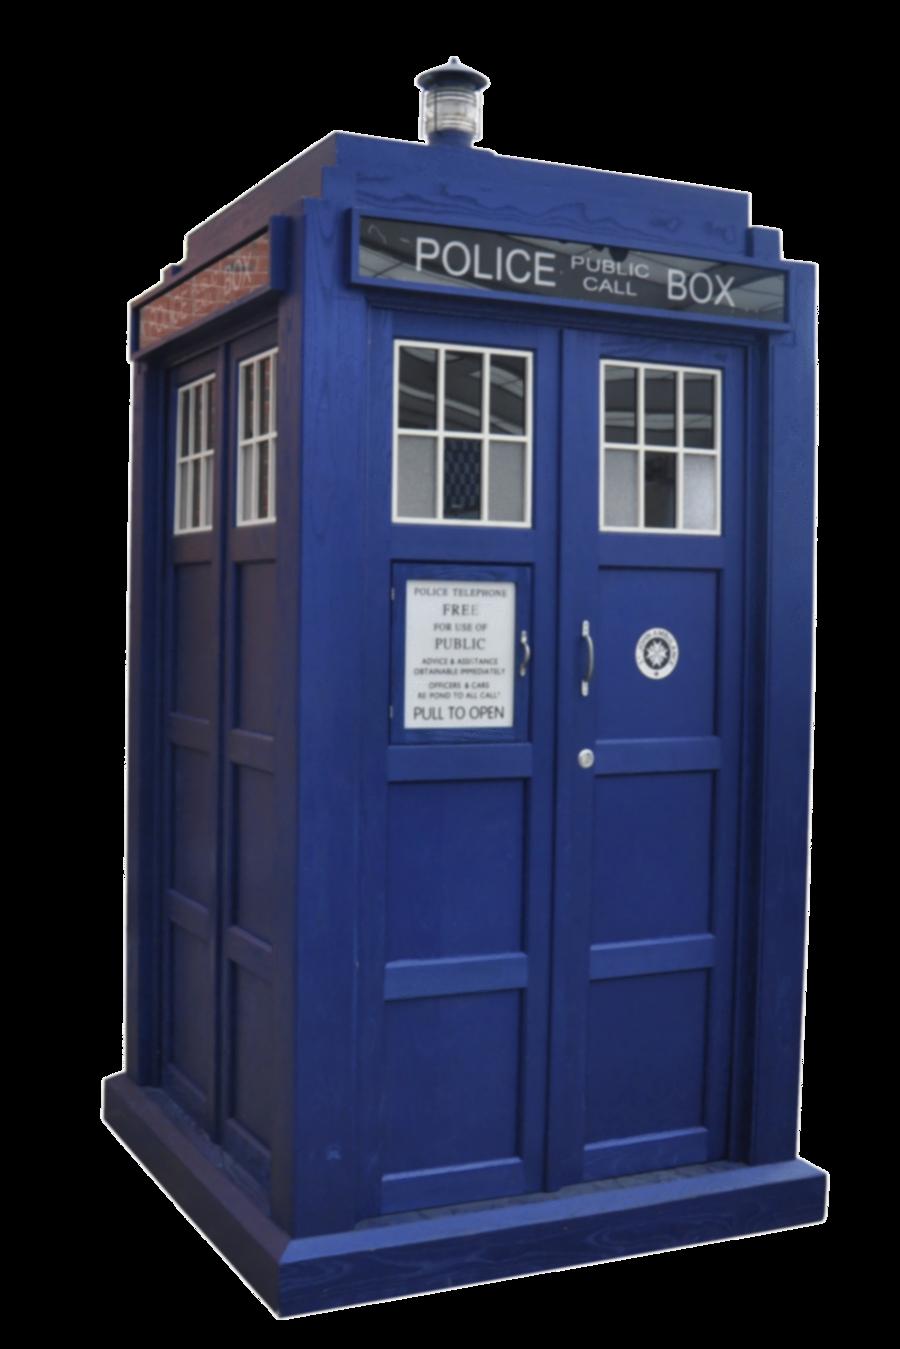 Doctor Who TARDIS Clip Art N5 free image.